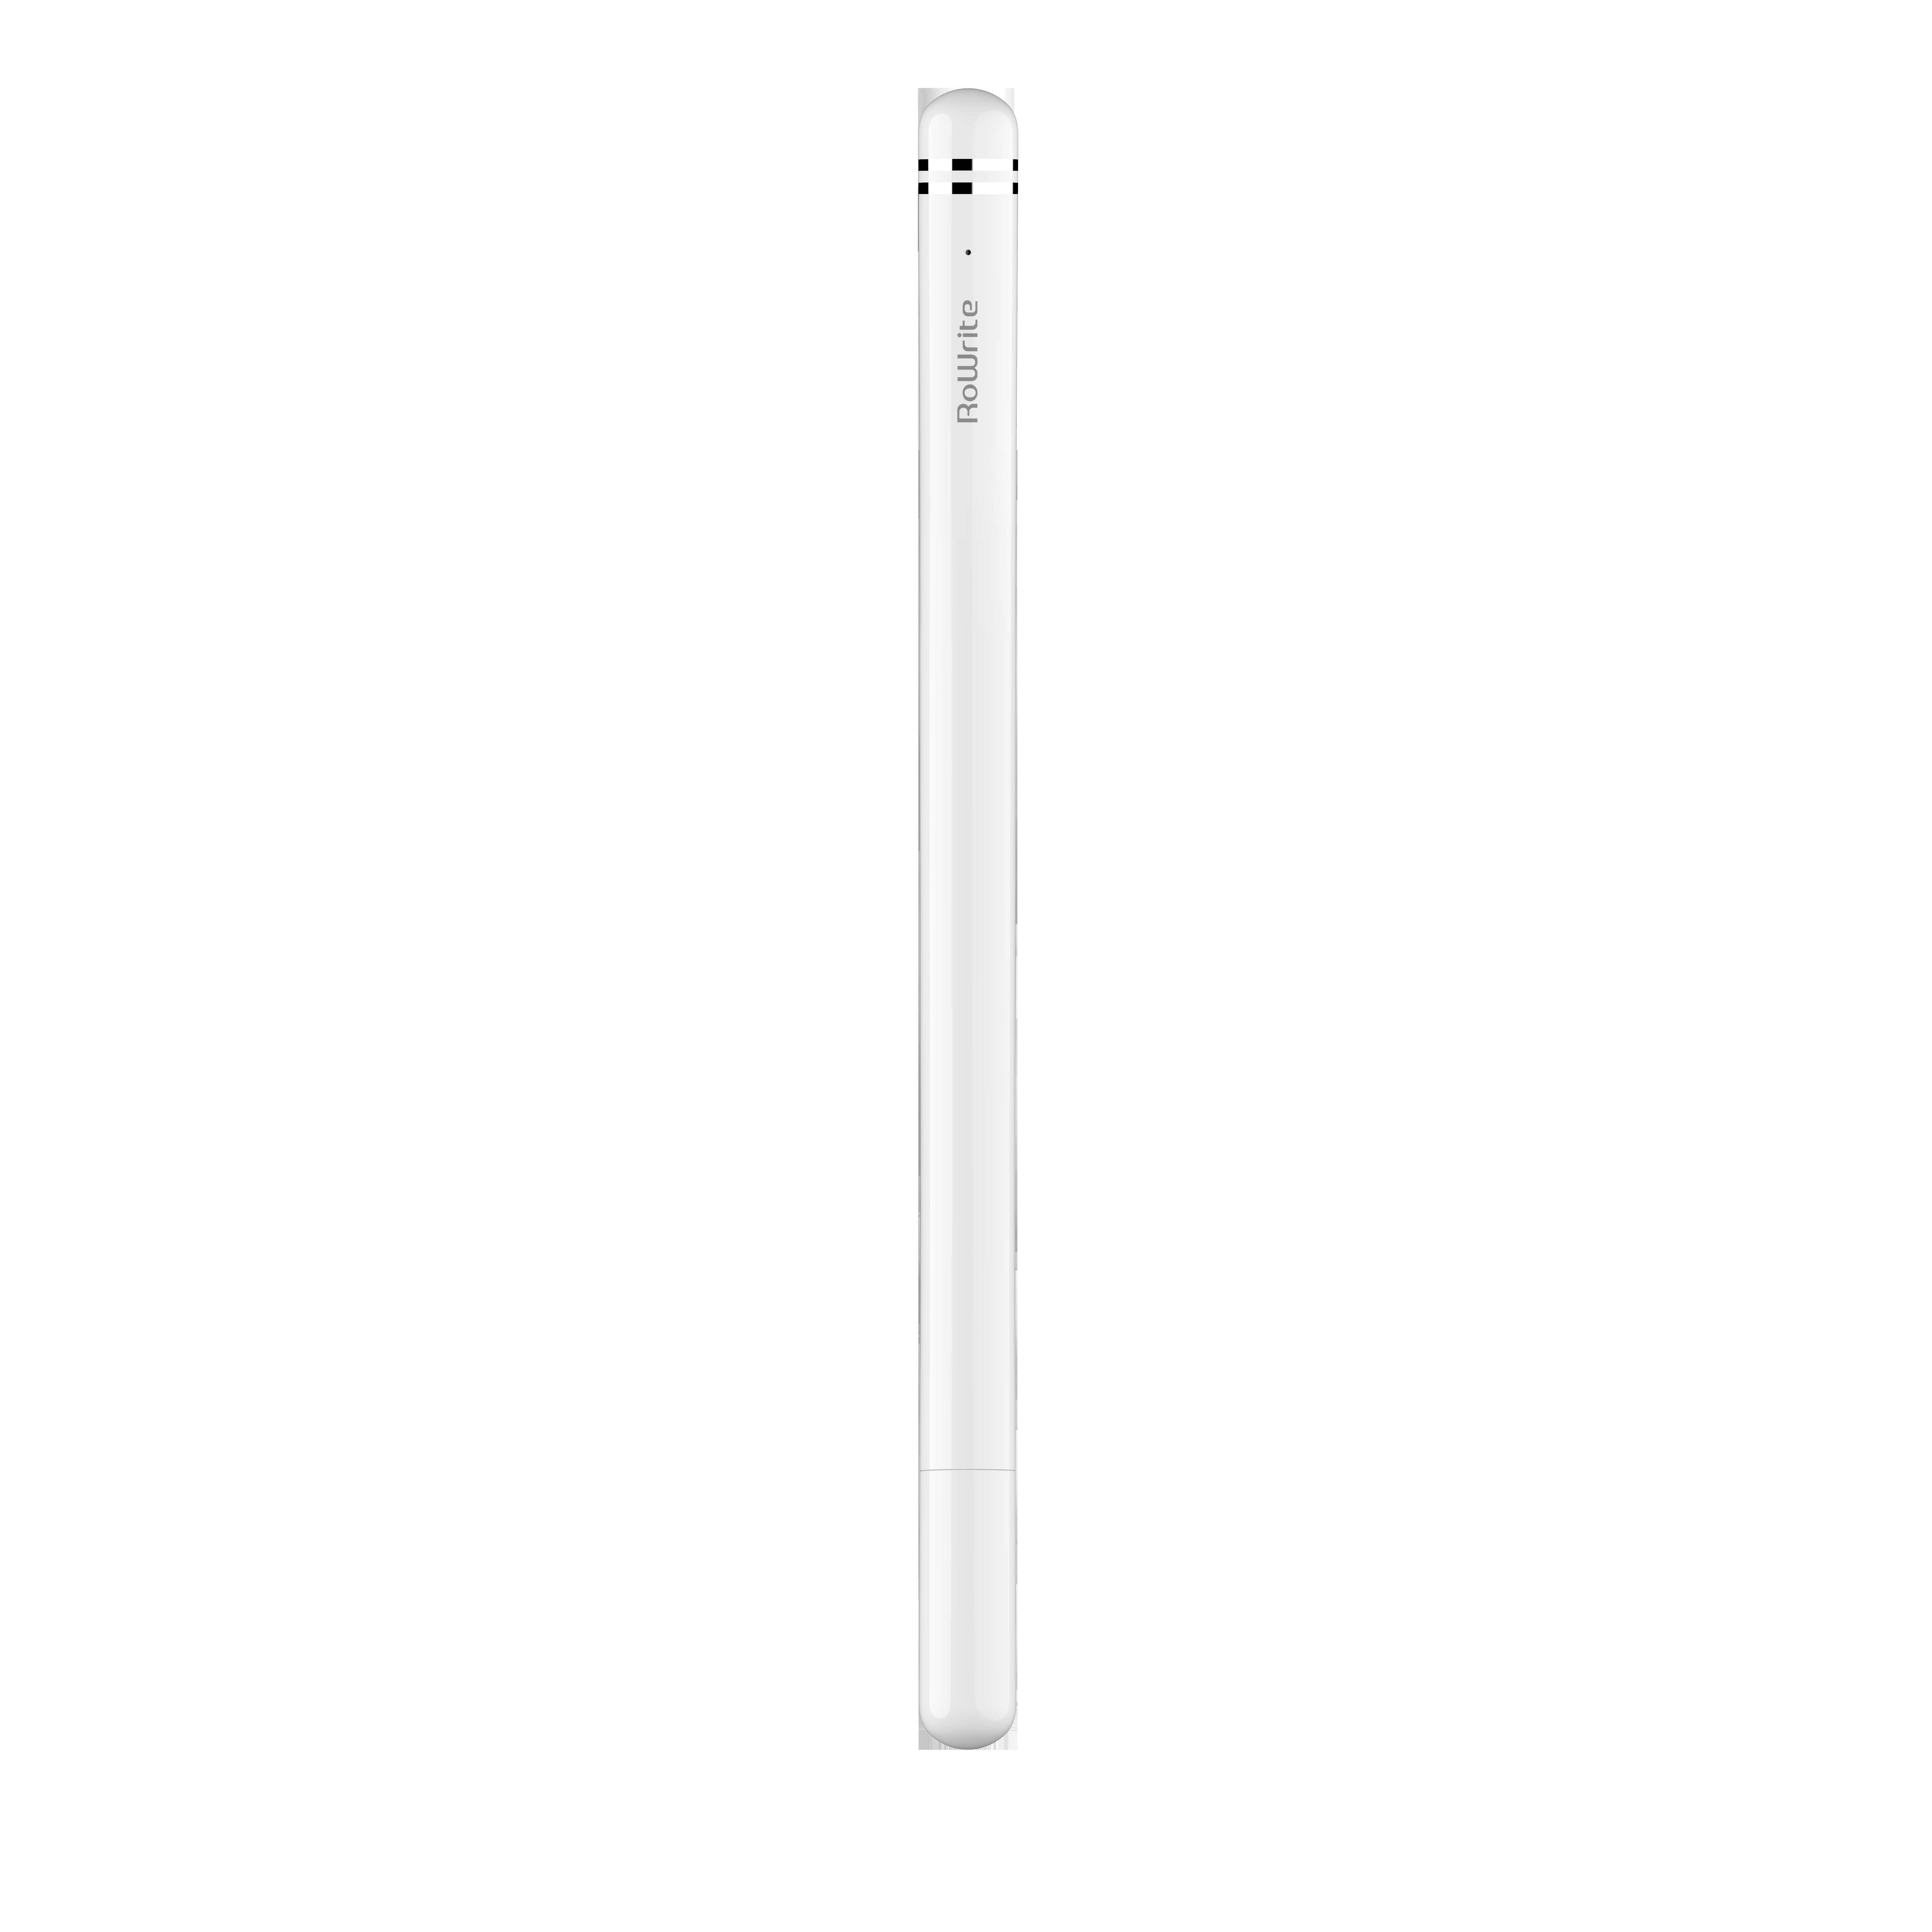 Rowrite 2 pen